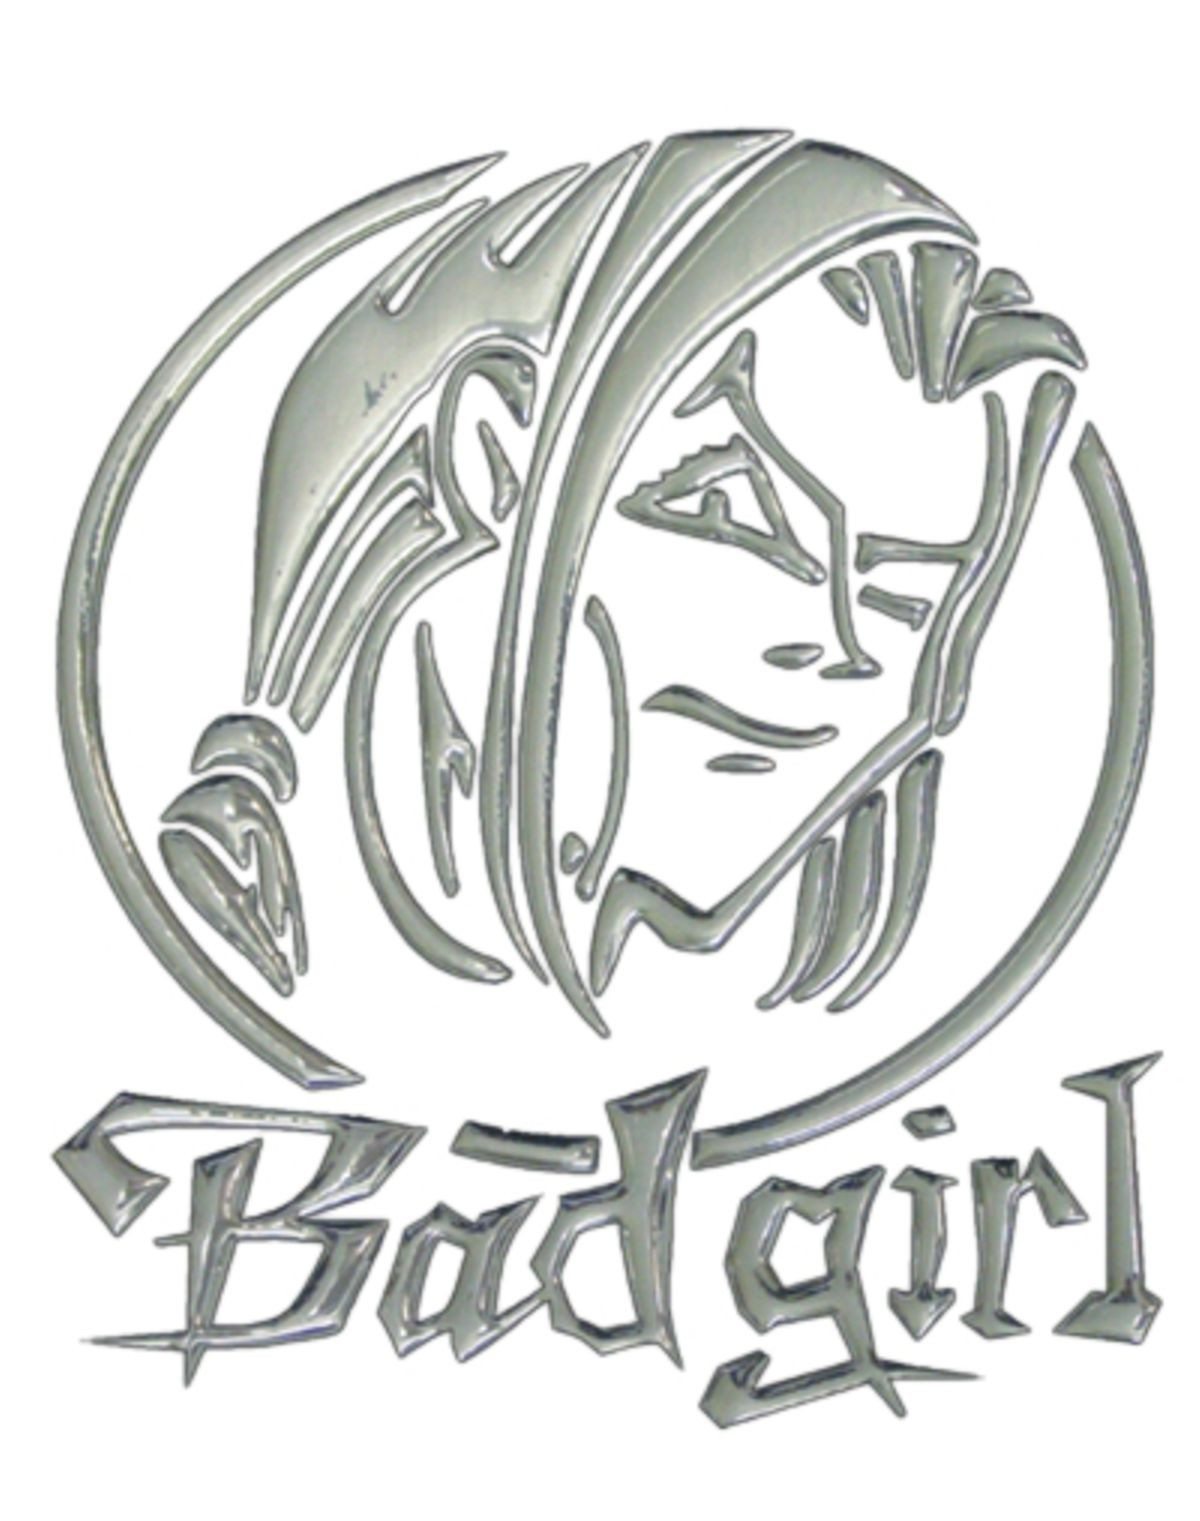 3D-Chrome-Sticker Bad Girl 200 x 165 mm 001